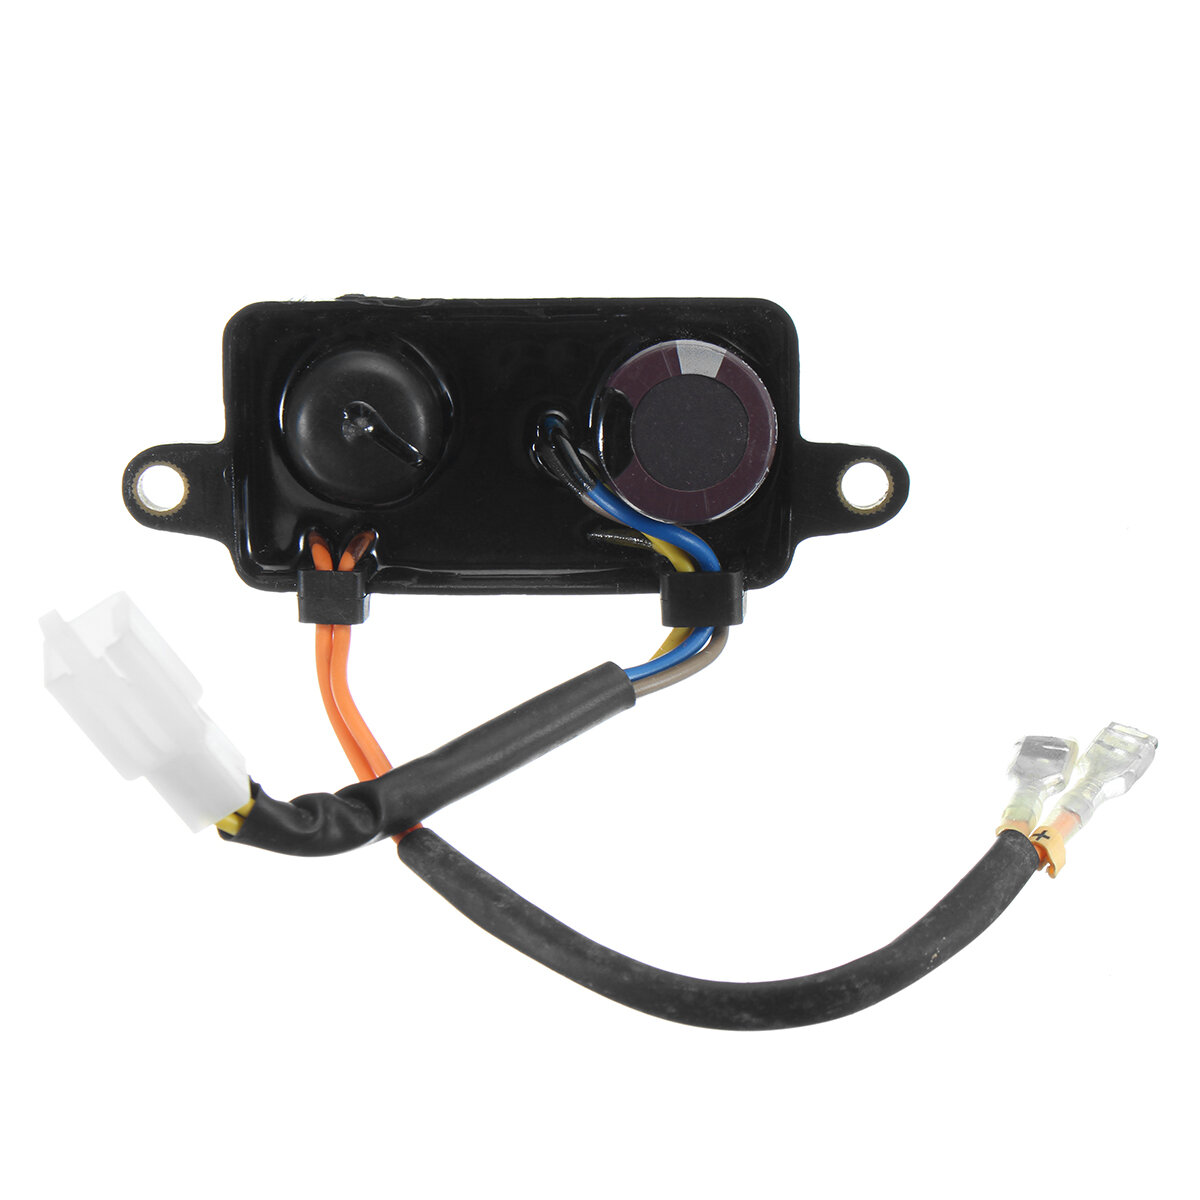 hight resolution of voltage regulator fits kubota low boy gl6500s av6500 b generator genset